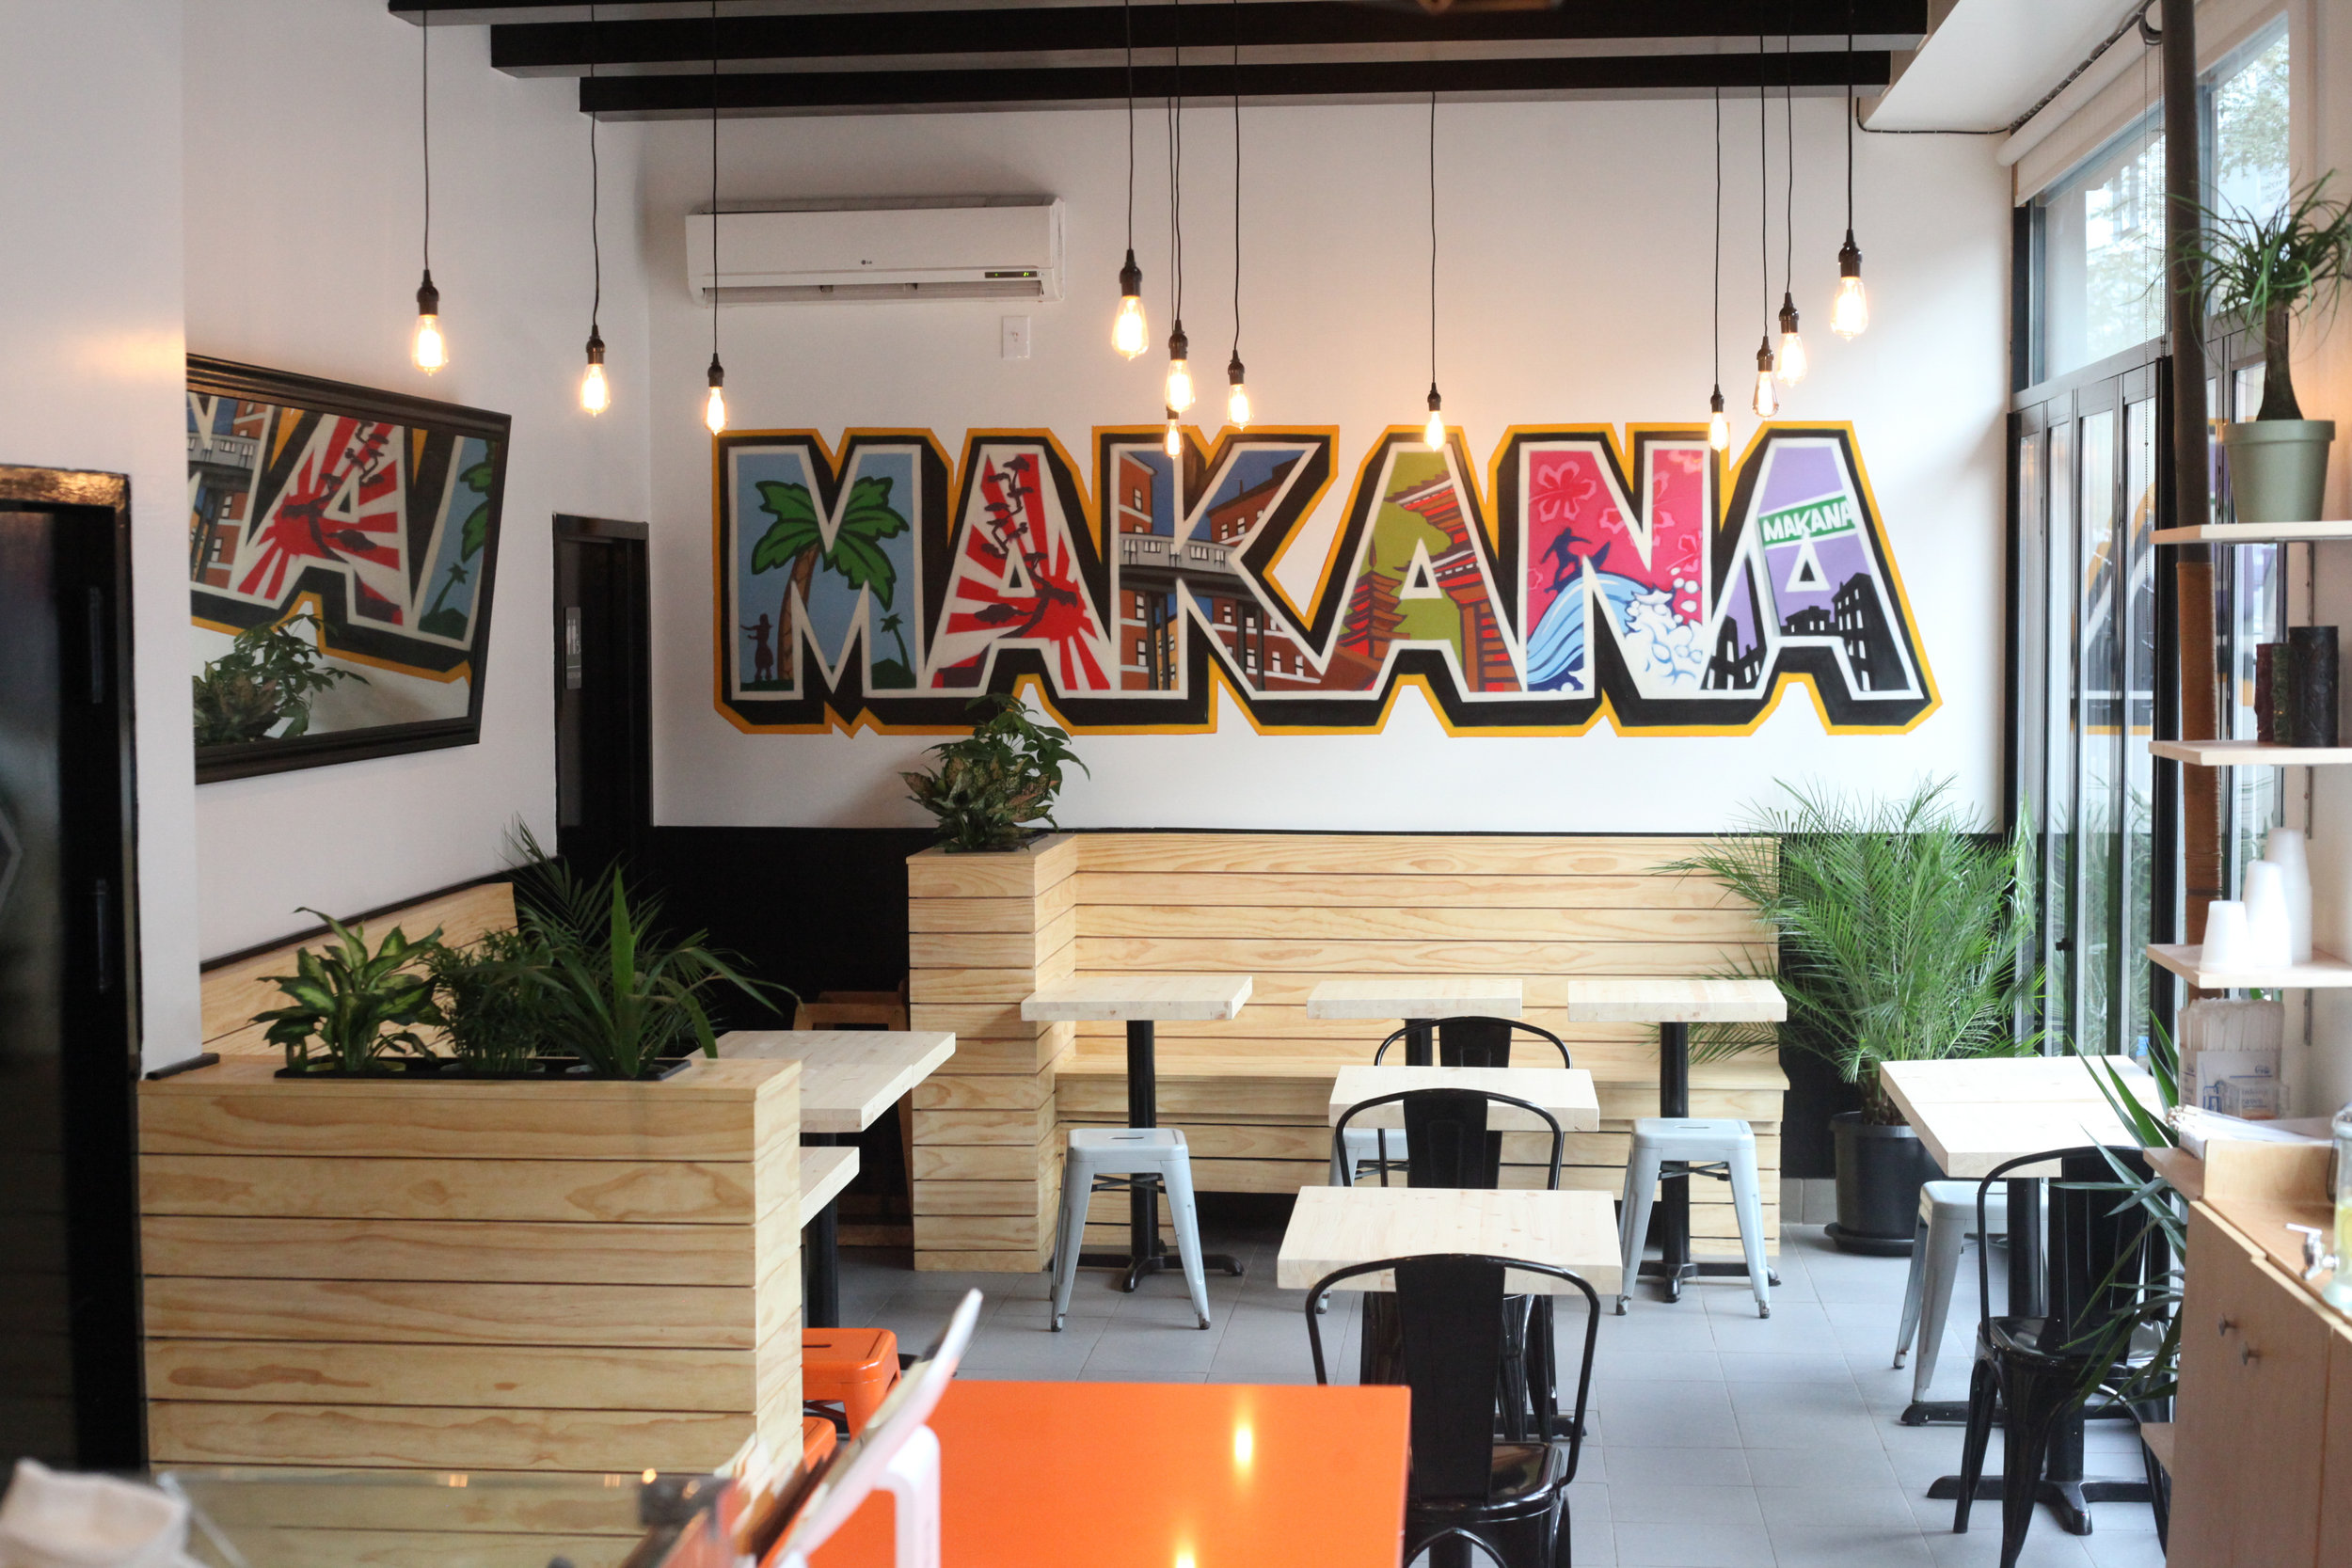 Makana_Location-19.jpg